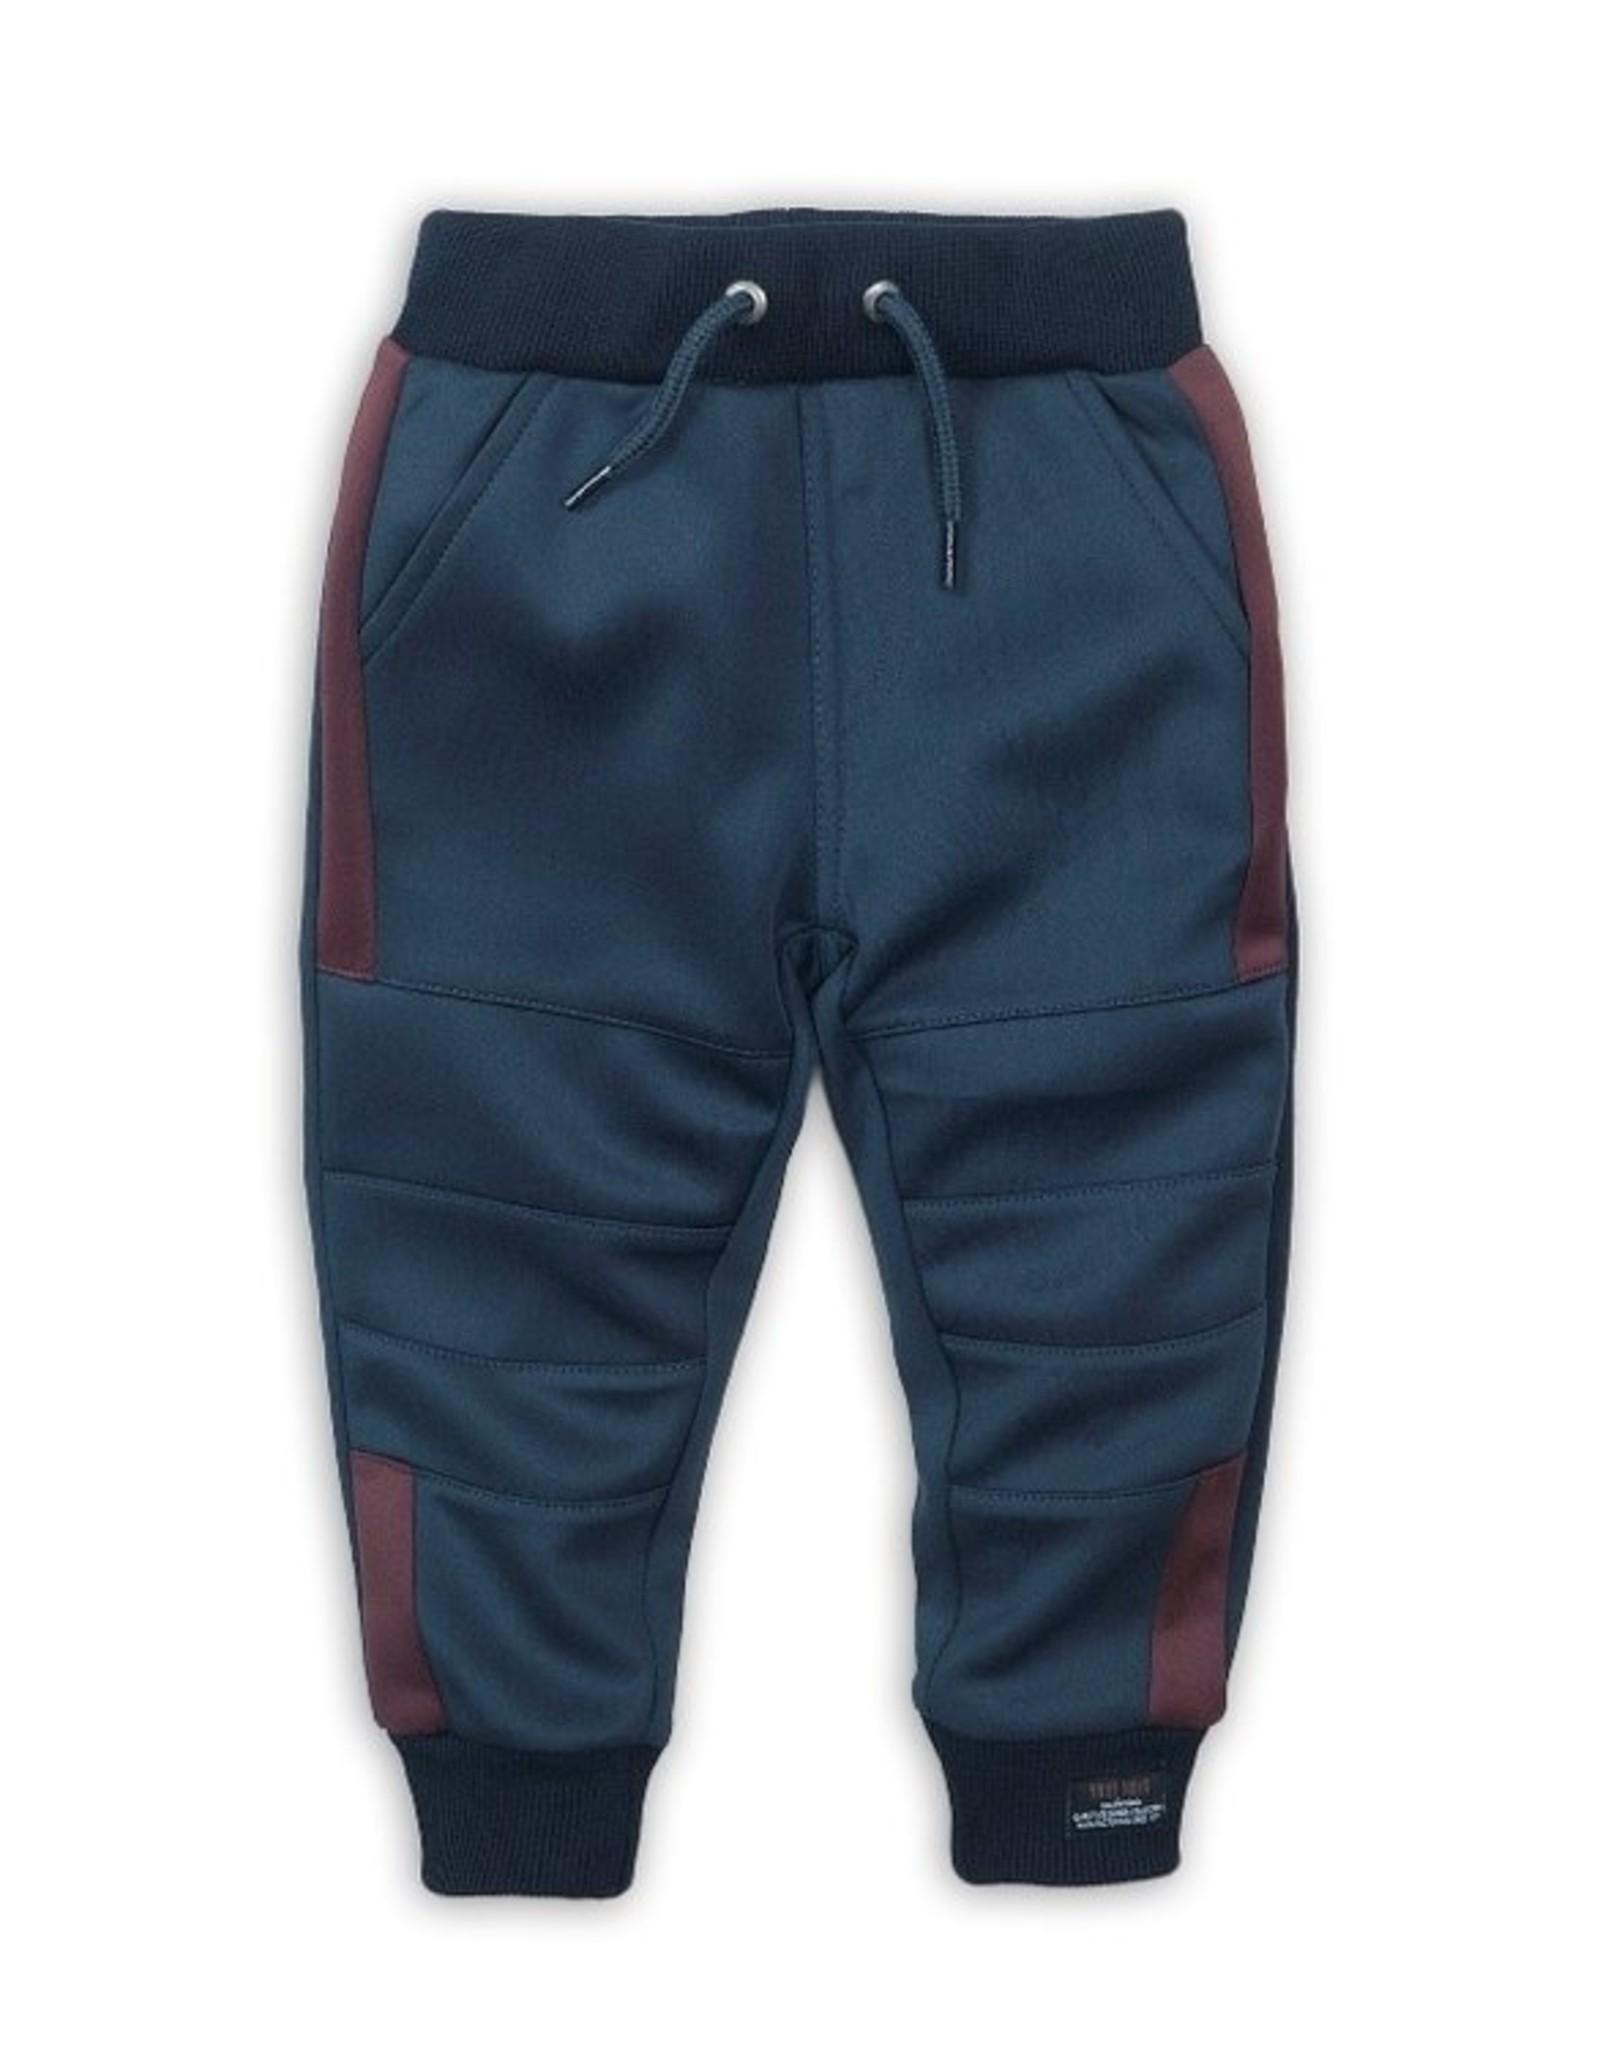 Koko Noko FA20 Blue/Burgundy Sweat Pants